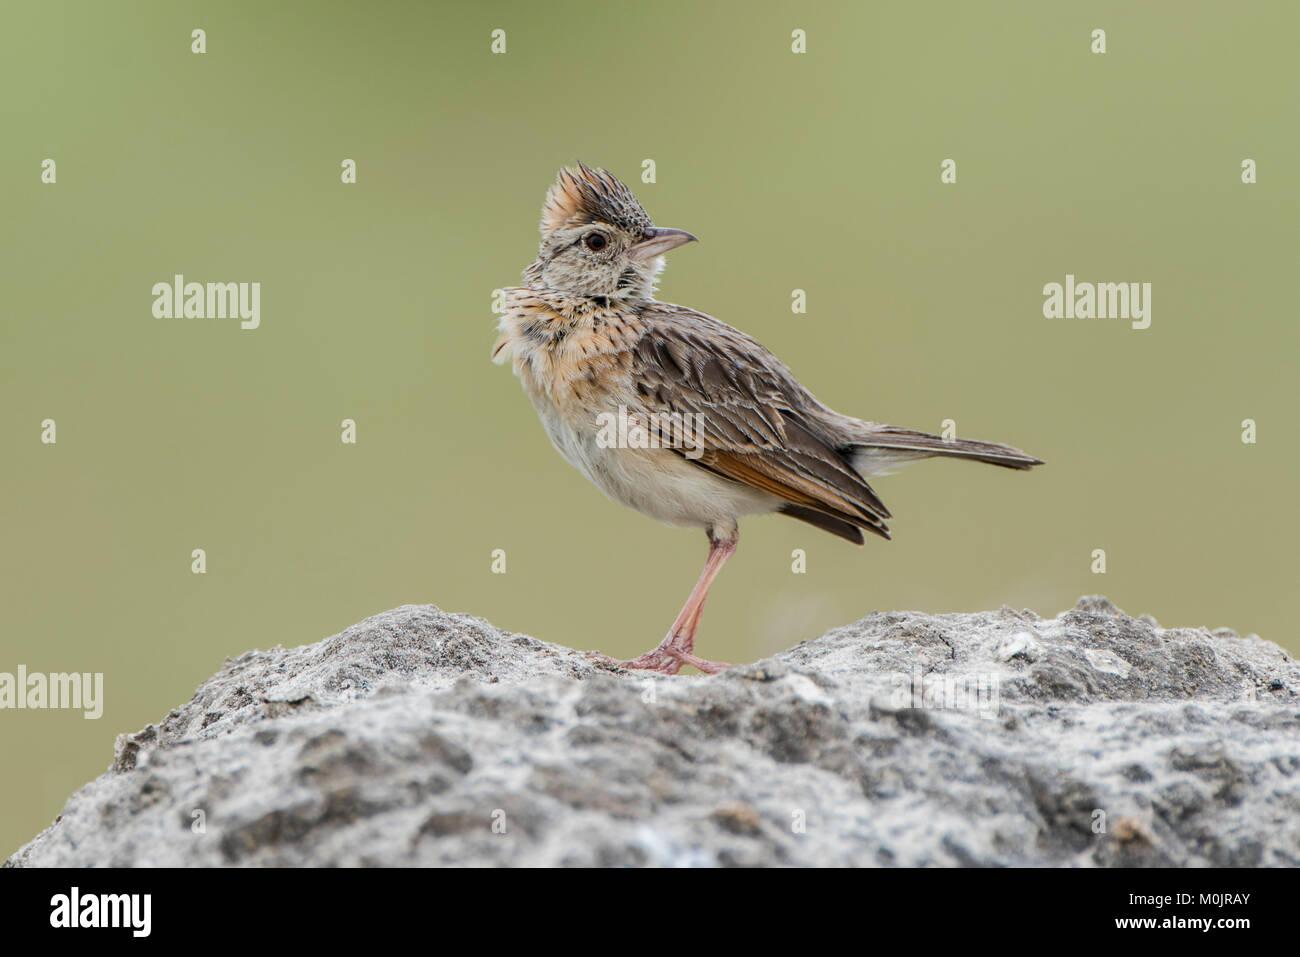 Rufous-naped lark (Mirafra africana) sits on a stone, Savuti, Chobe National Park, Chobe District, Botswana Stock Photo